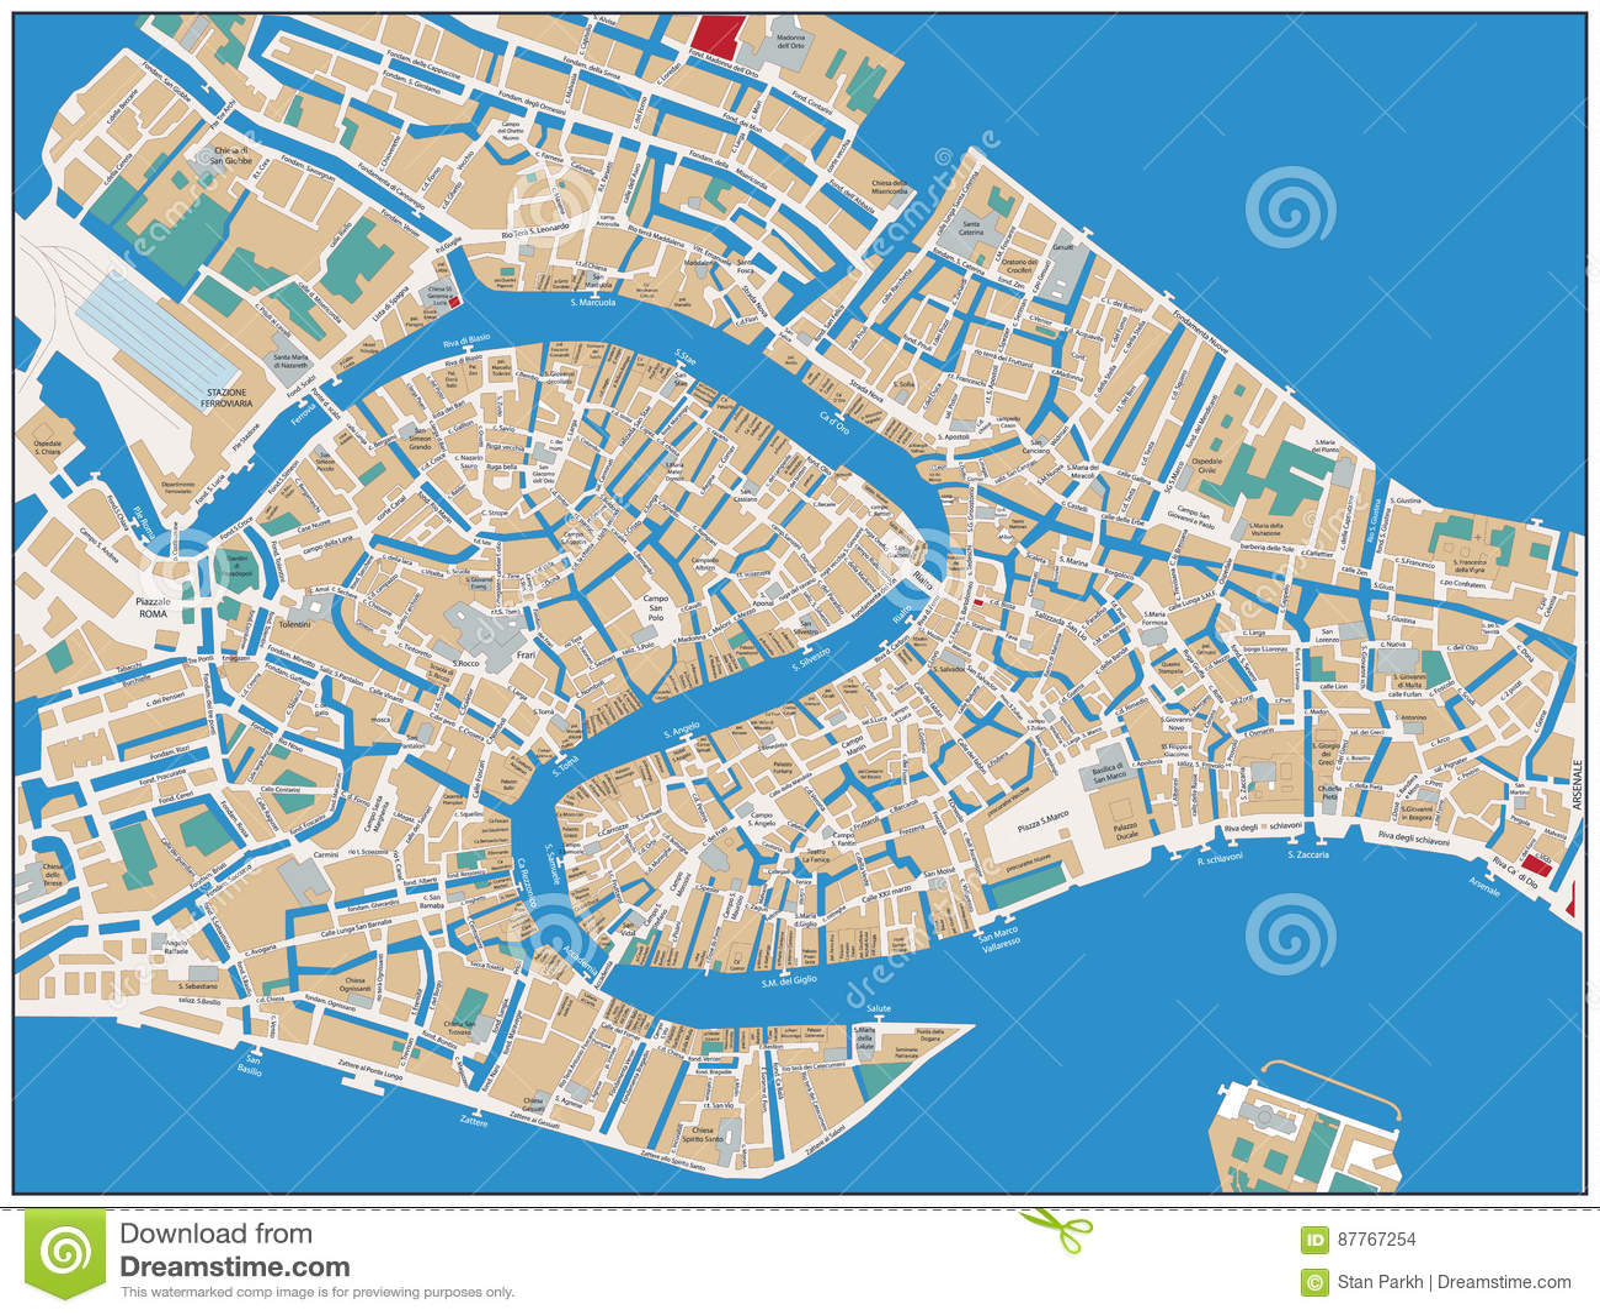 Cartina Stradale Venezia.Mappa Stradale Di Venezia Illustrazione Vettoriale Illustrazione Di Grafico 87767254